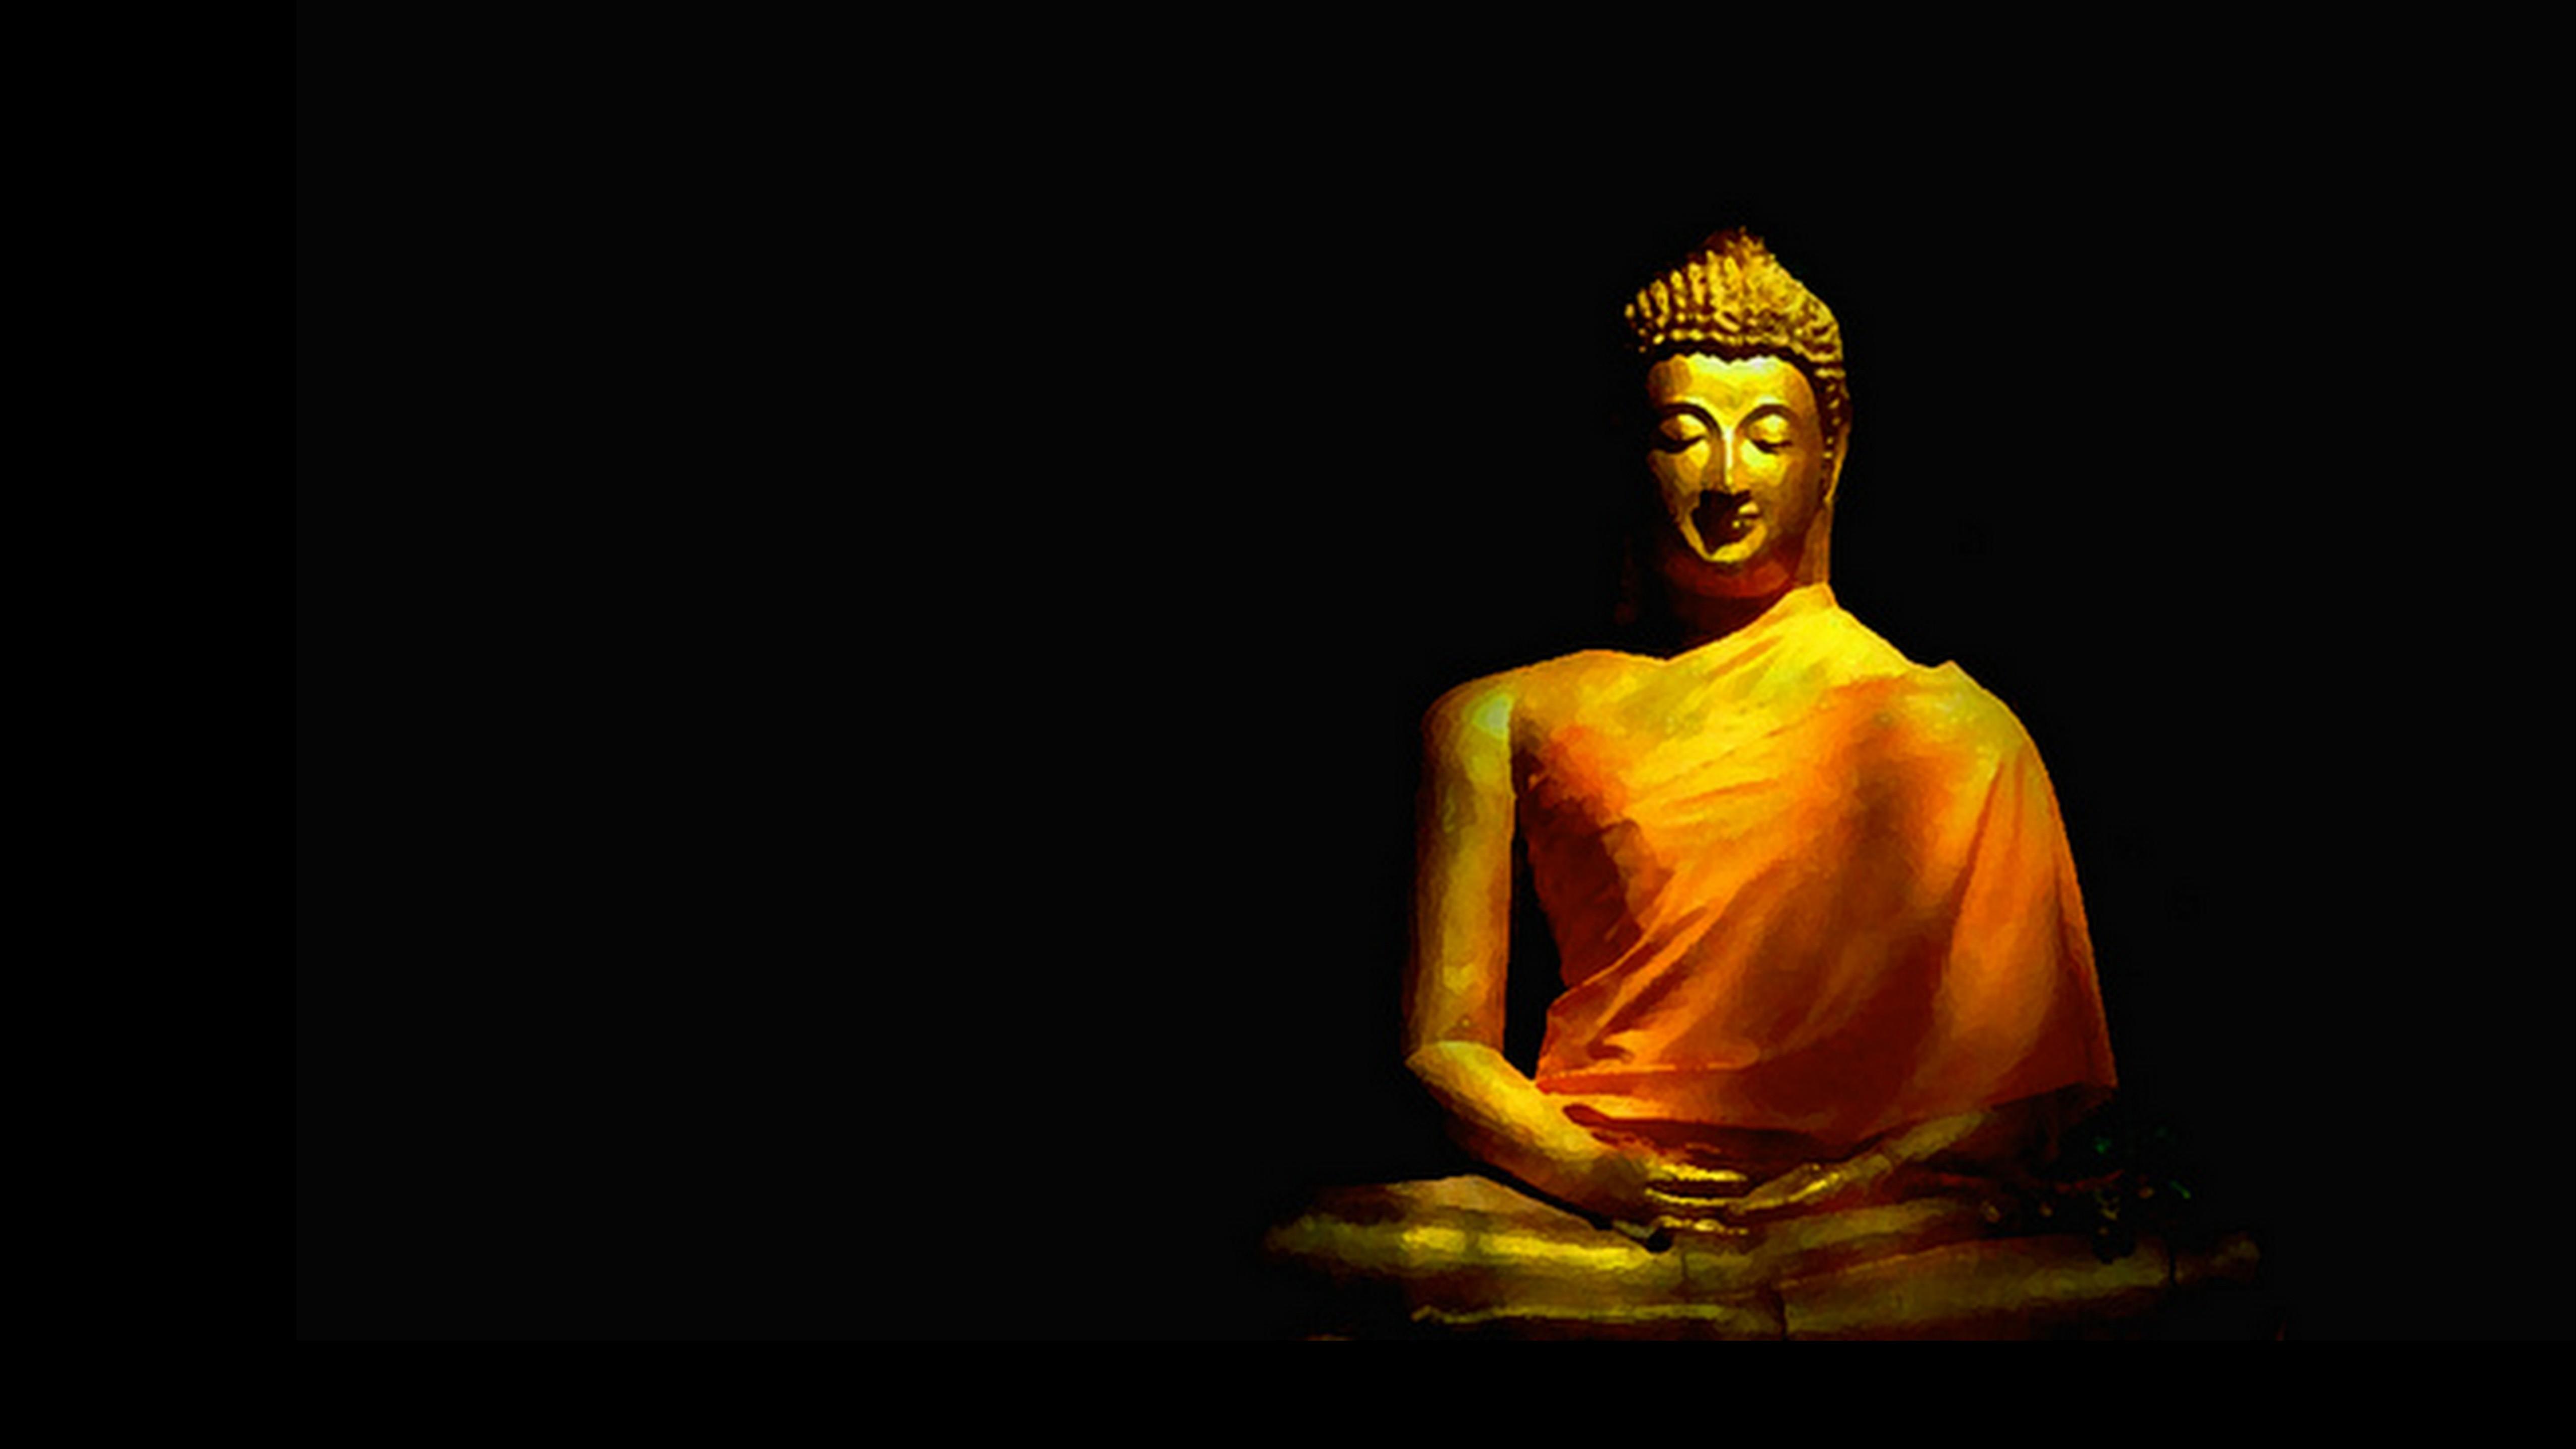 lord buddha tv live - HD5120×2880